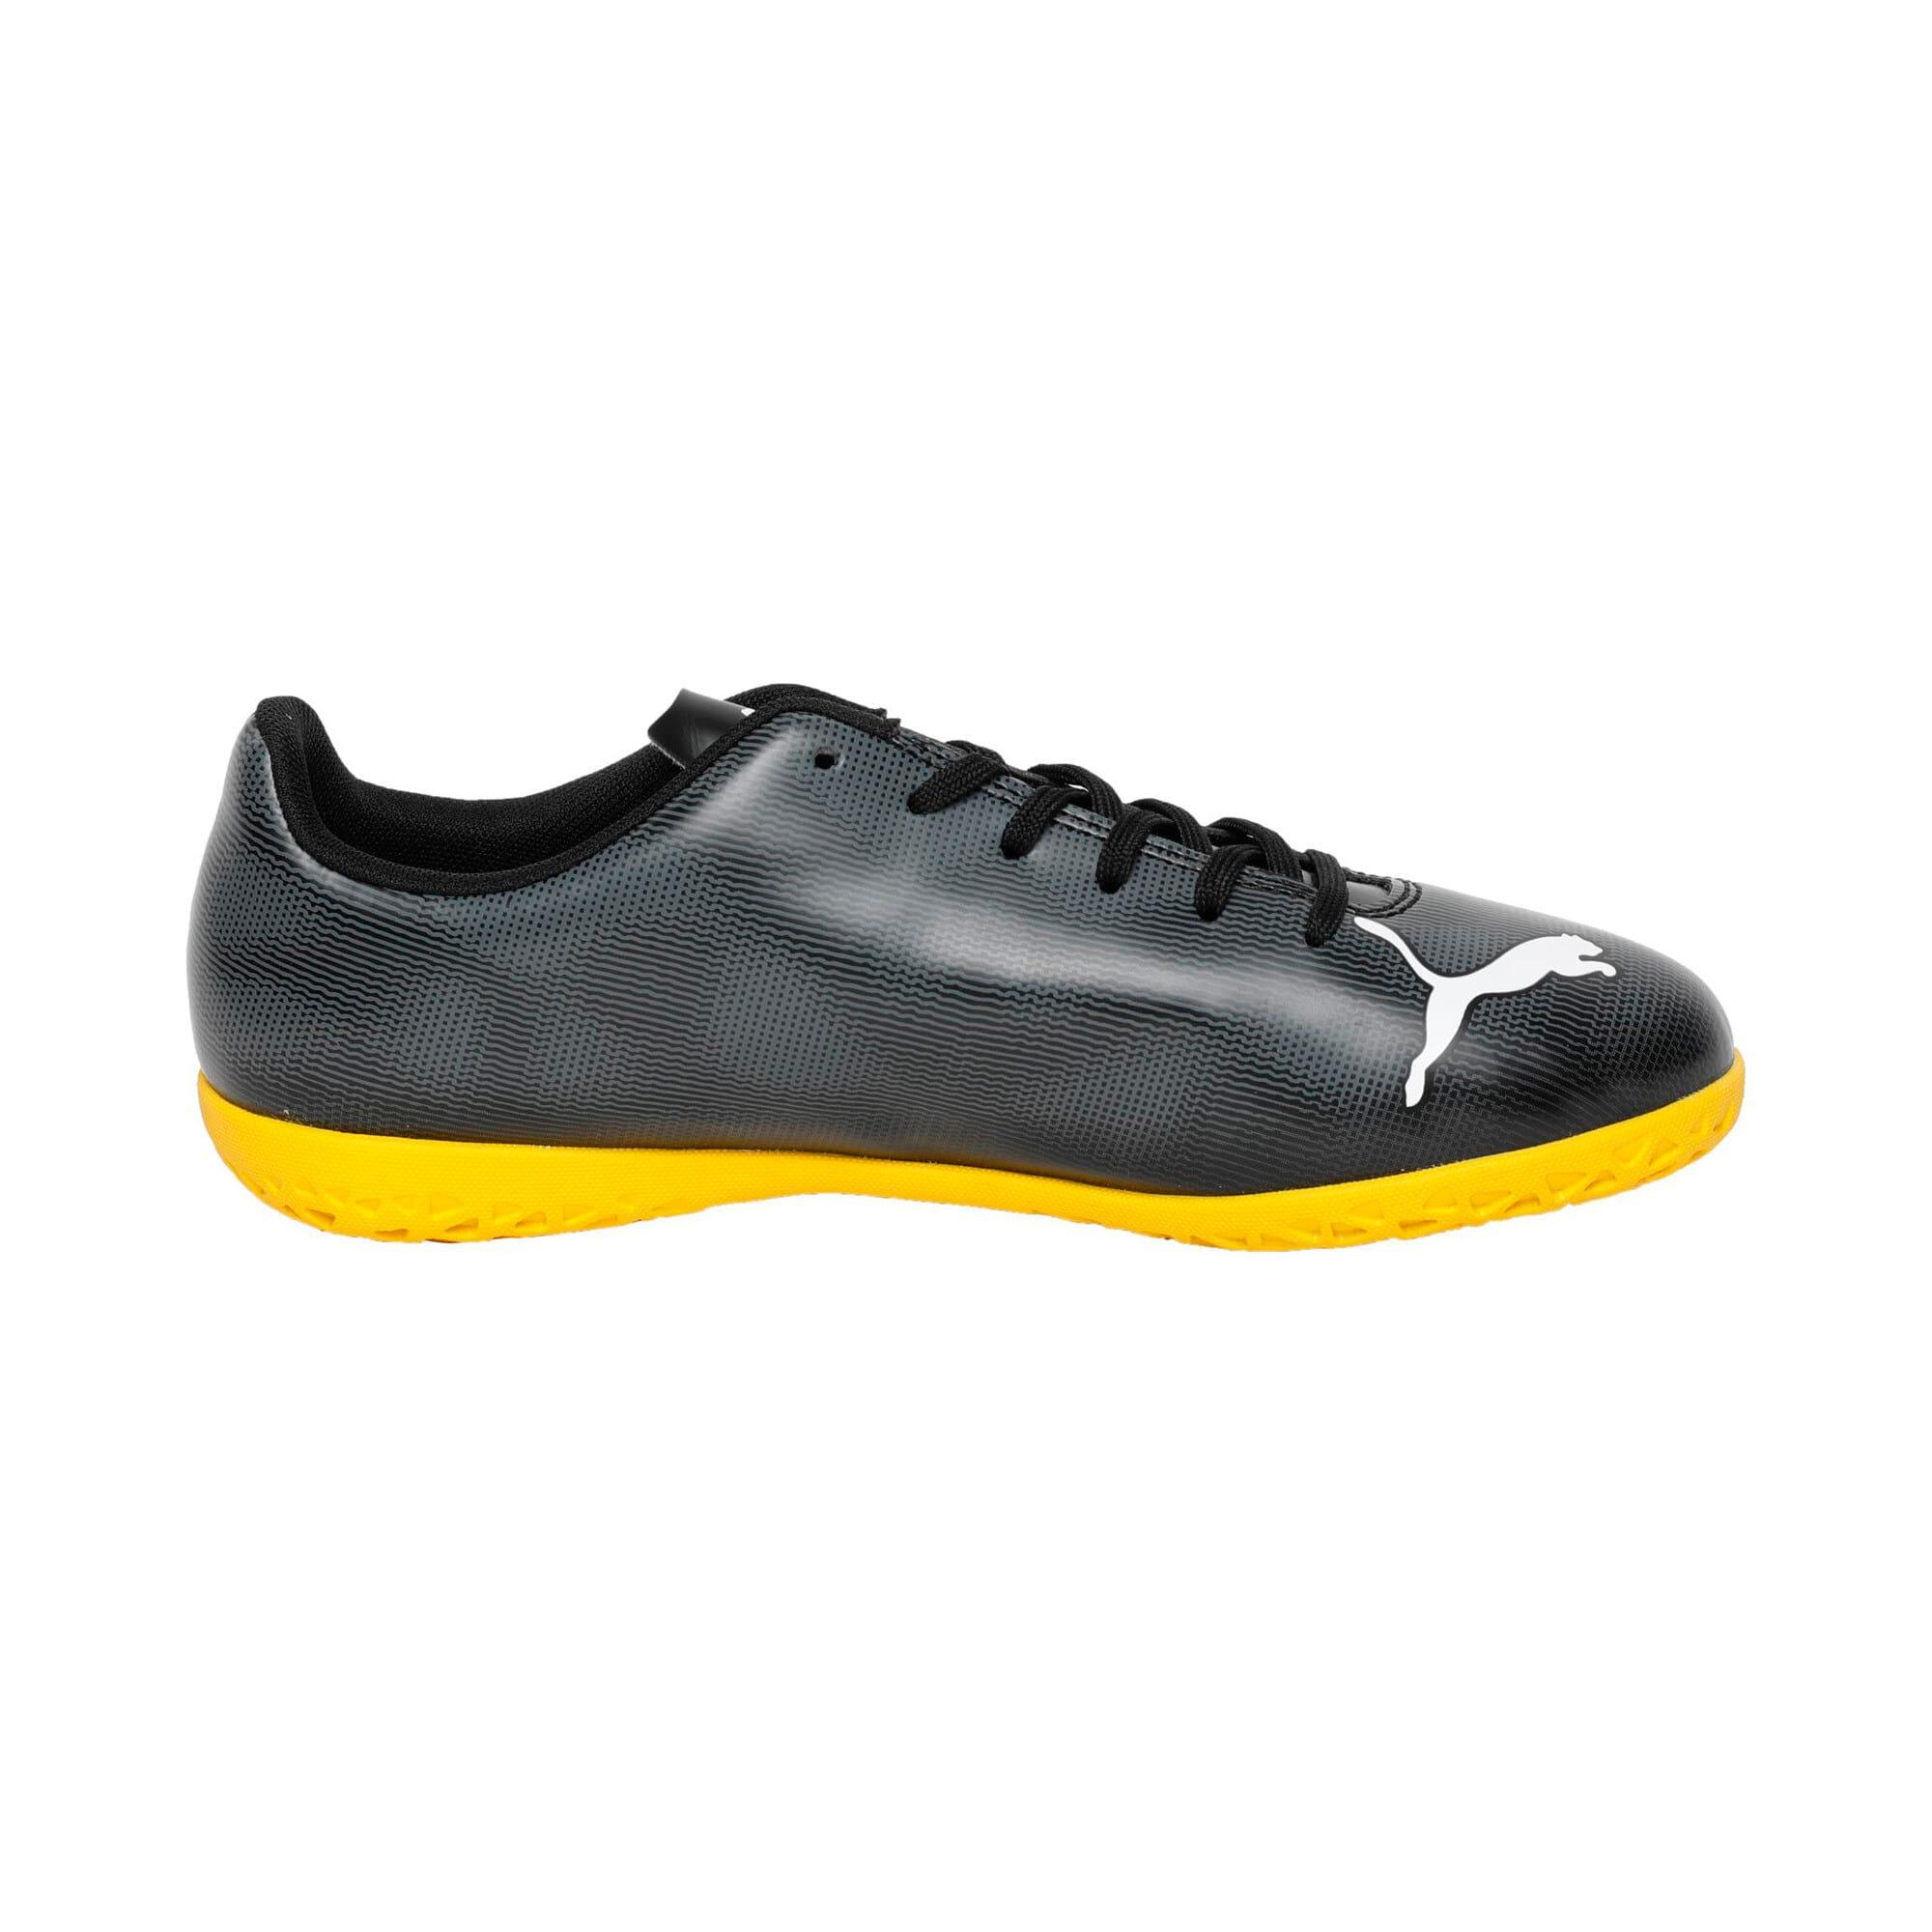 Thumbnail 5 of Rapido IT Youth Football Boots, Black-White-Iron-Yellow, medium-IND